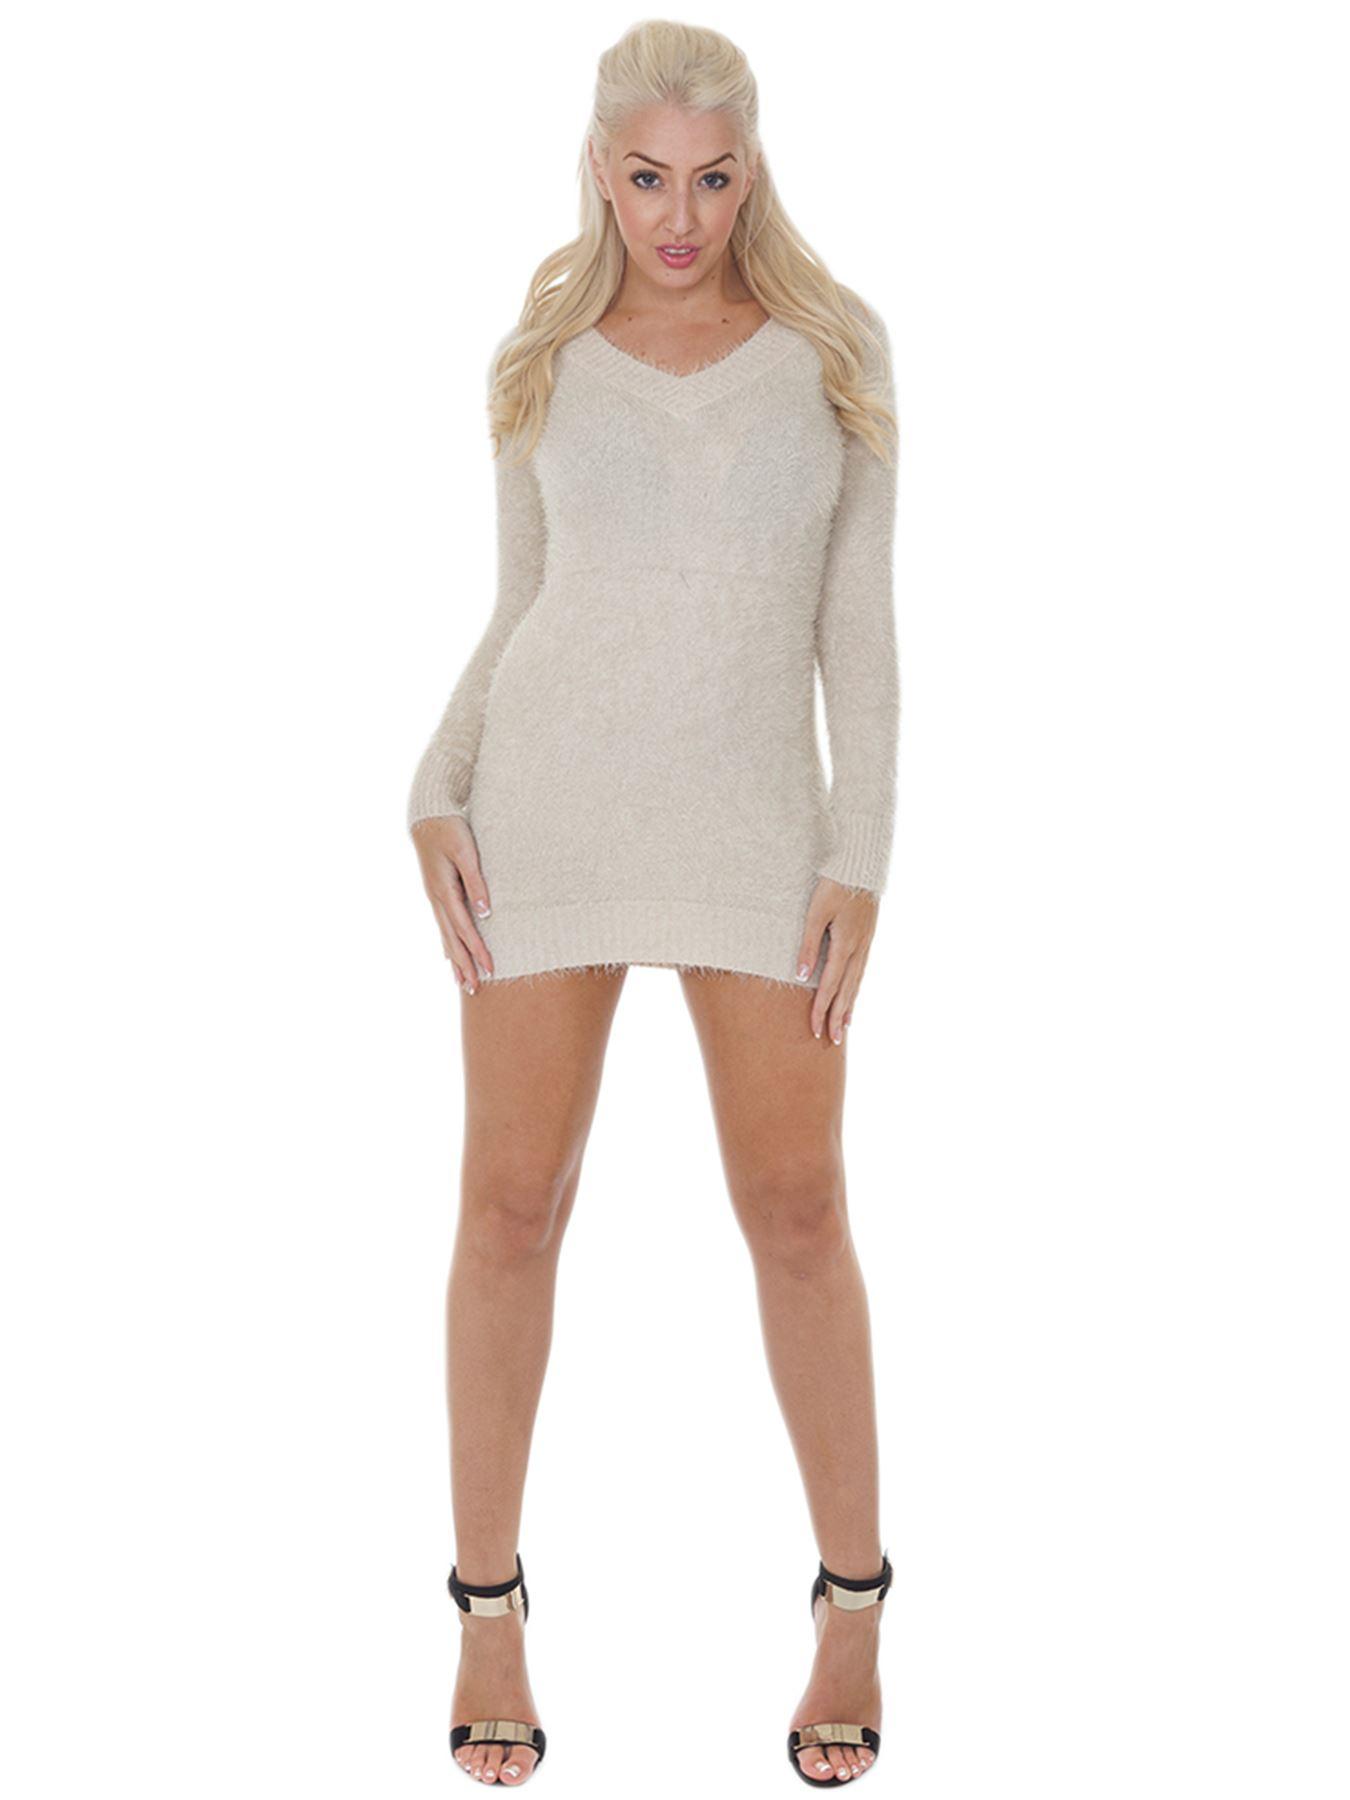 Pull-Femme-Femmes-Tricote-Cardigans-Plain-Tricot-Moelleux-Col-V-Manches-Longues miniature 5